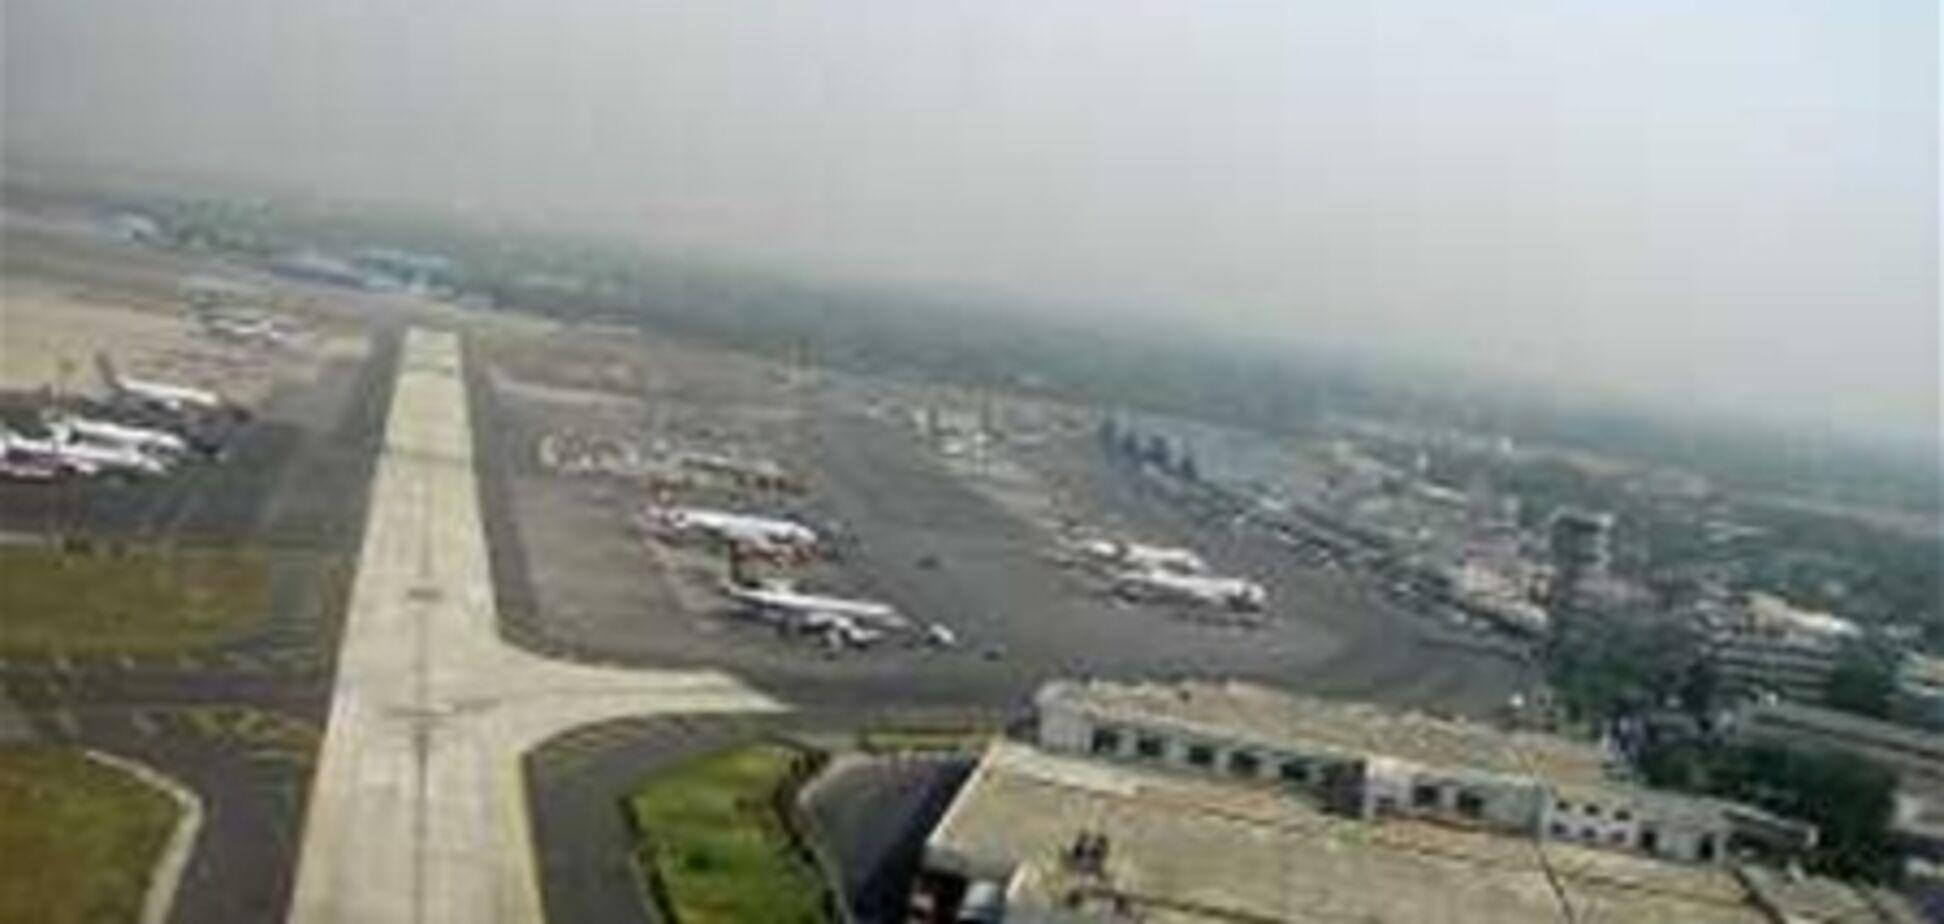 В аеропорту Нью-Делі сталася пожежа